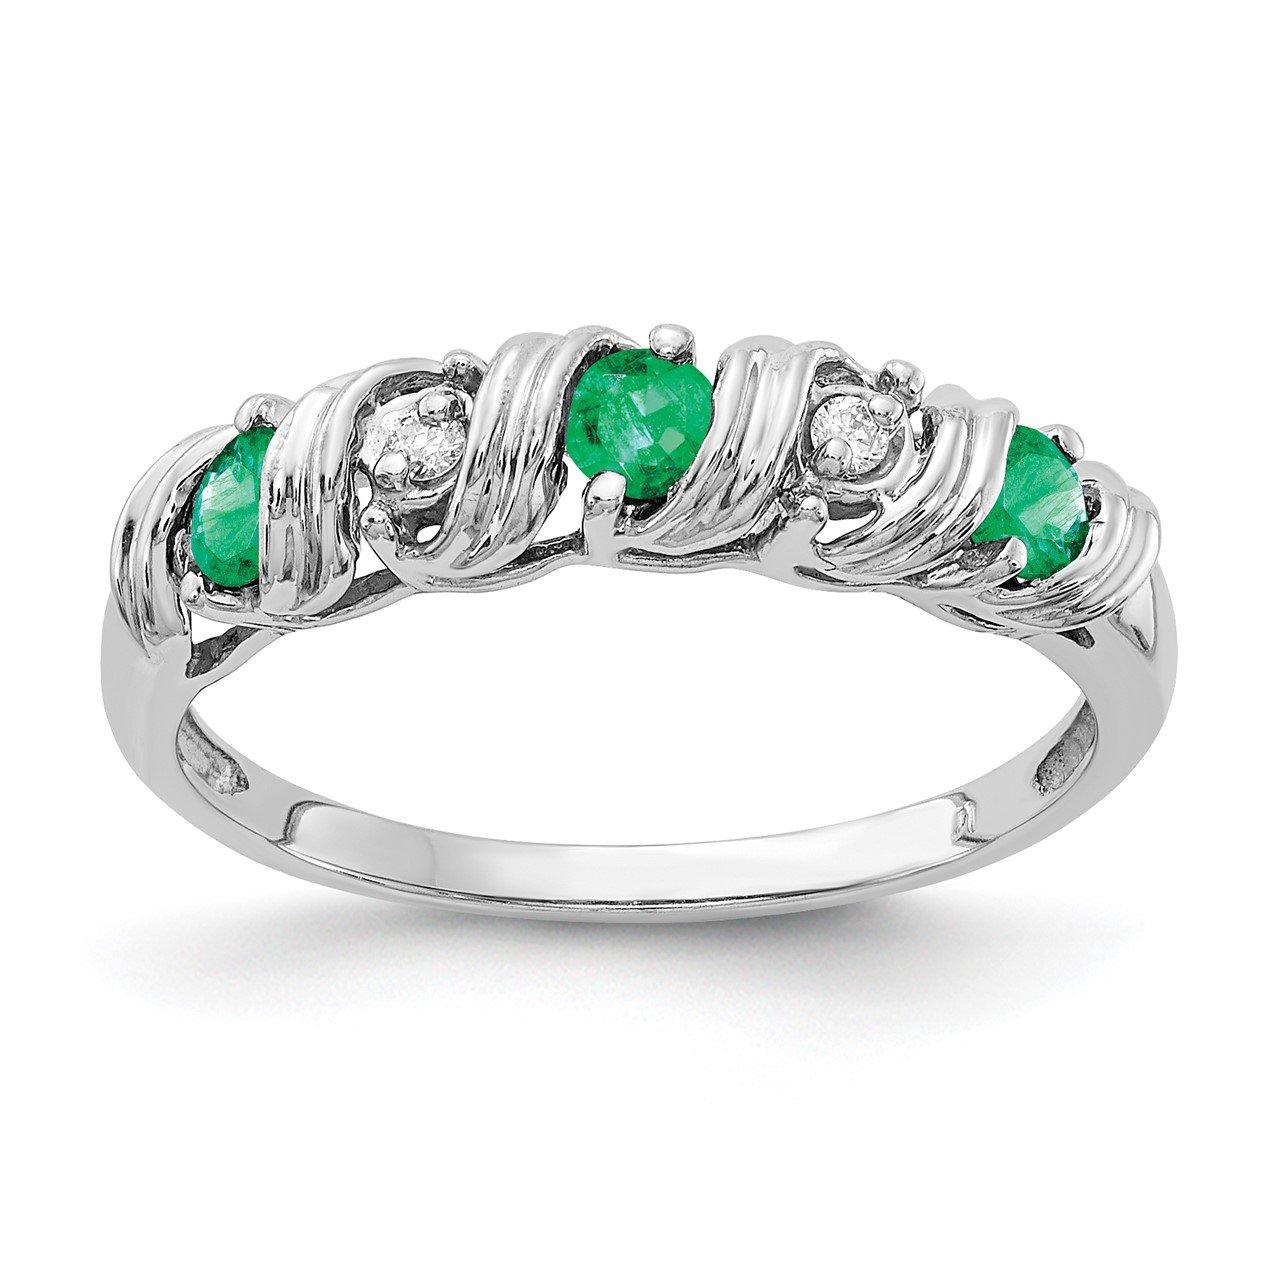 14k White Gold 2.75mm Emerald AA Diamond ring